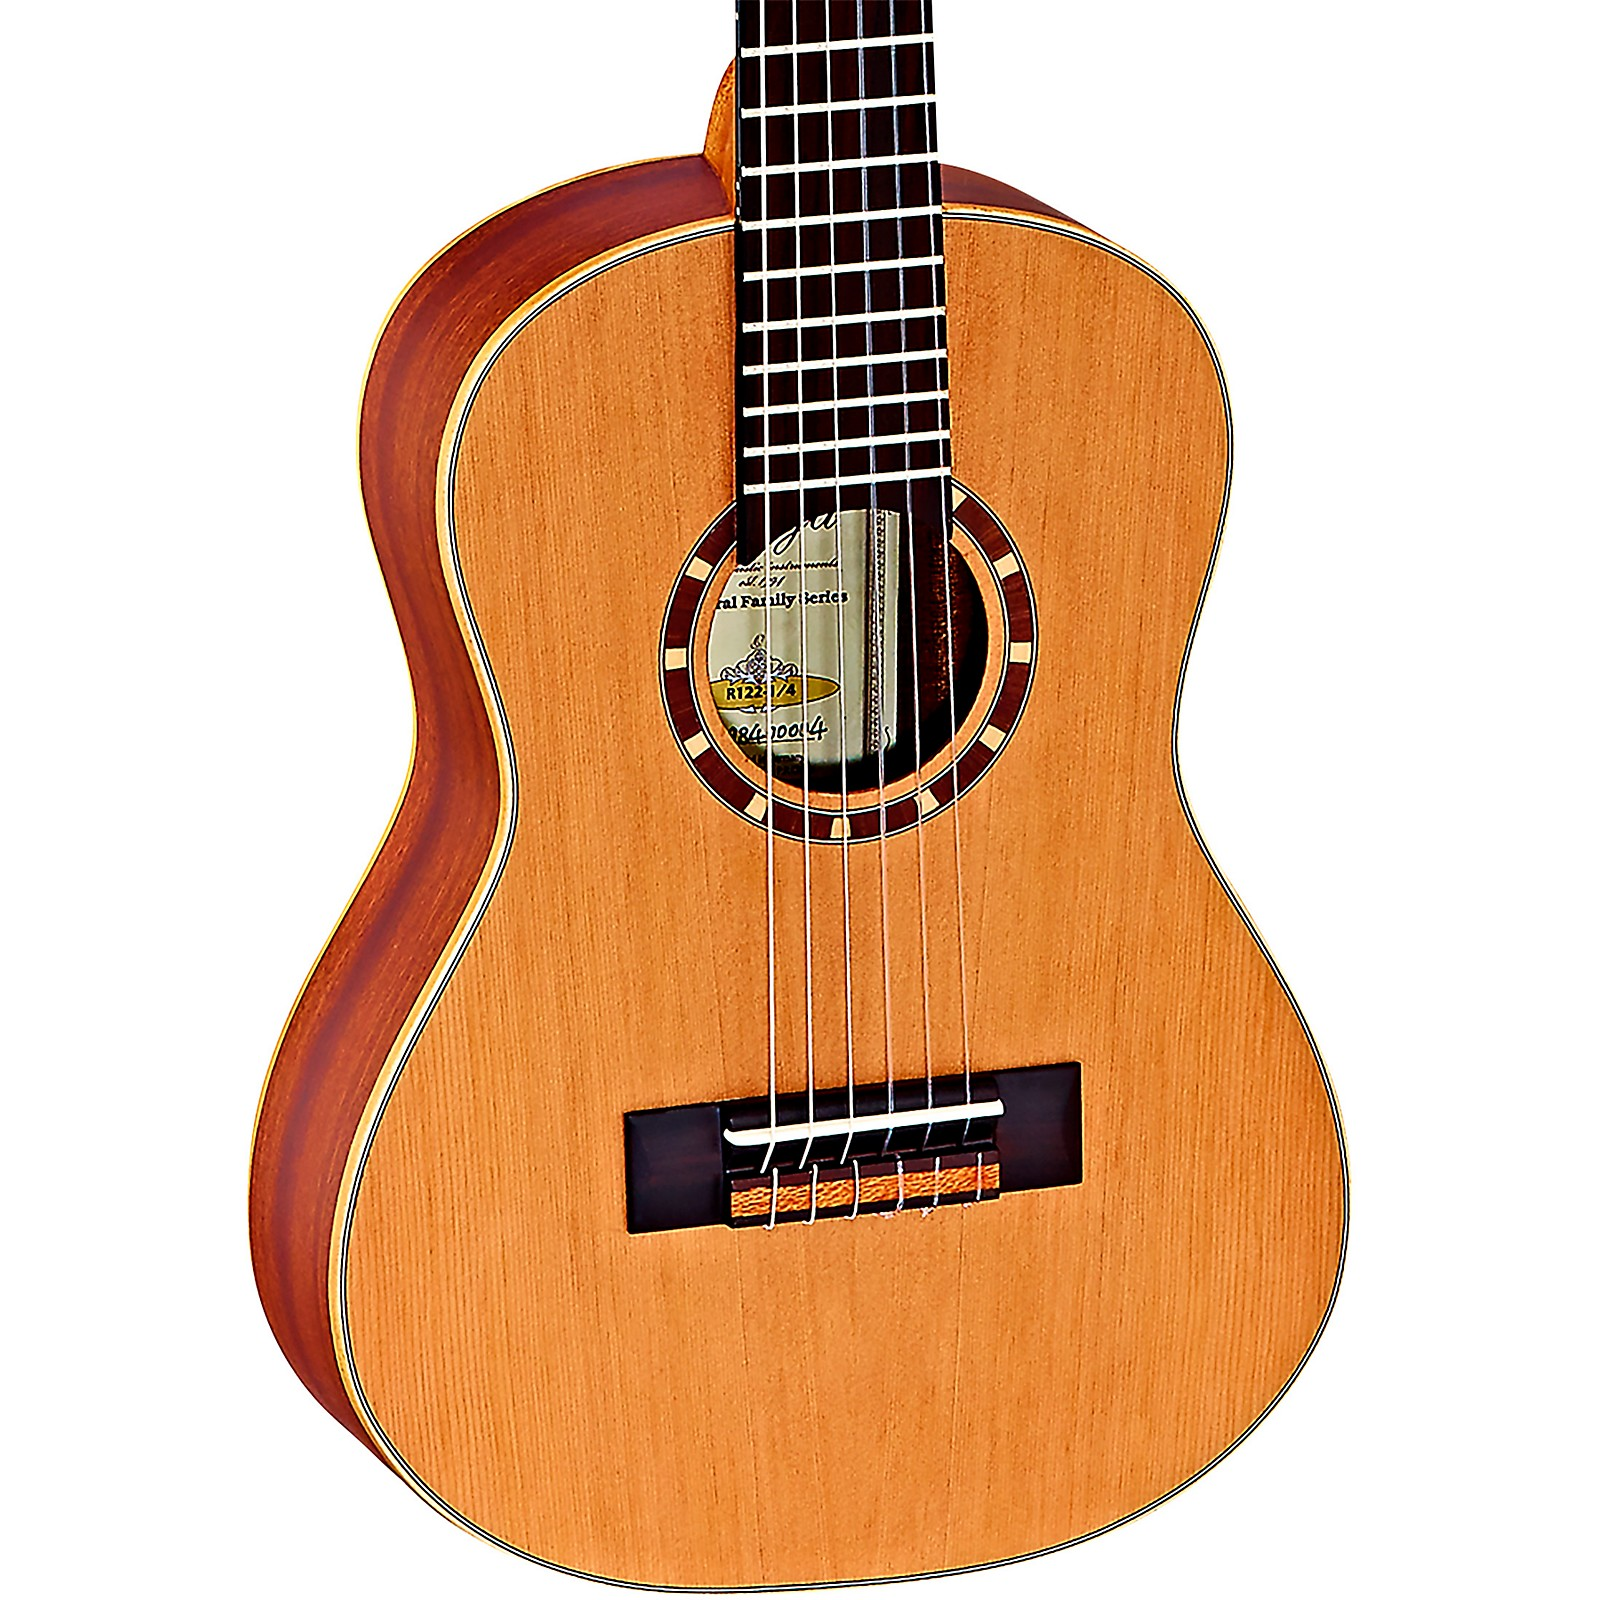 Ortega Family Series R122-1/4 1/4 Size Classical Guitar